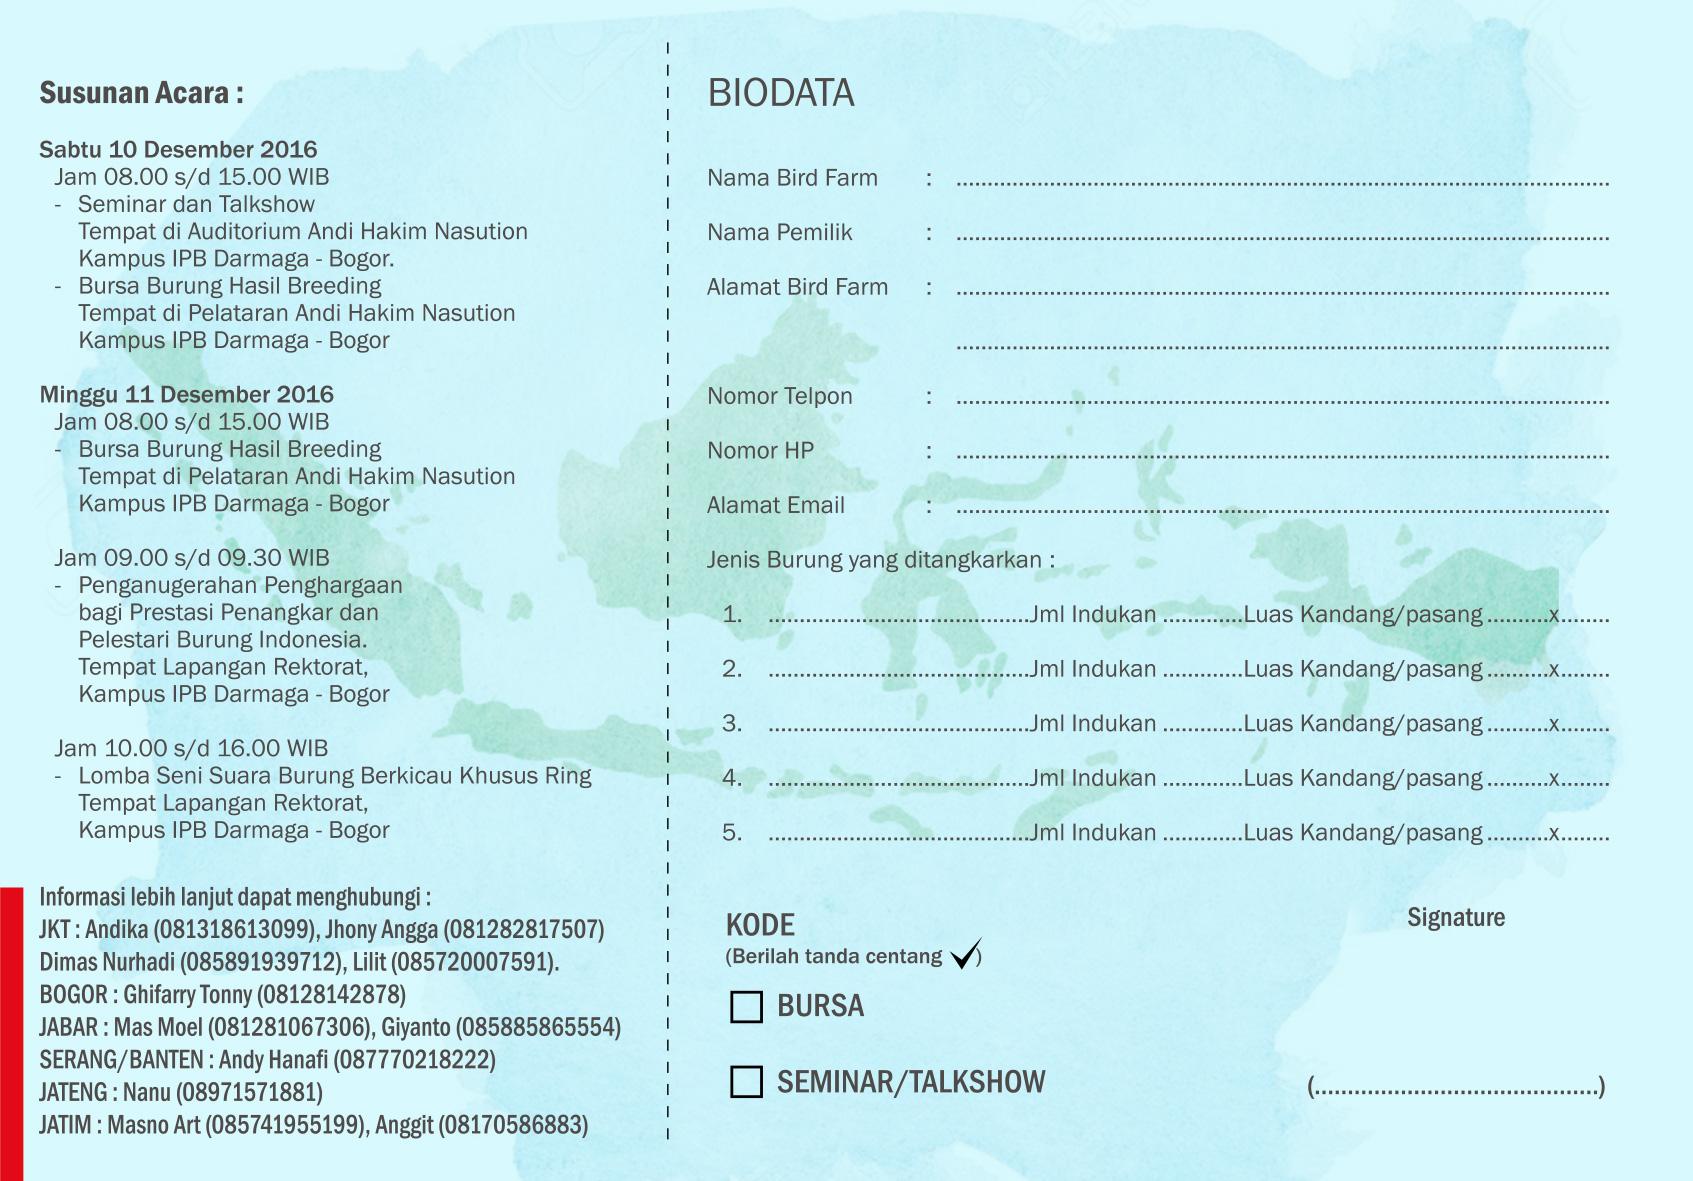 postcard-image-blk-revisi